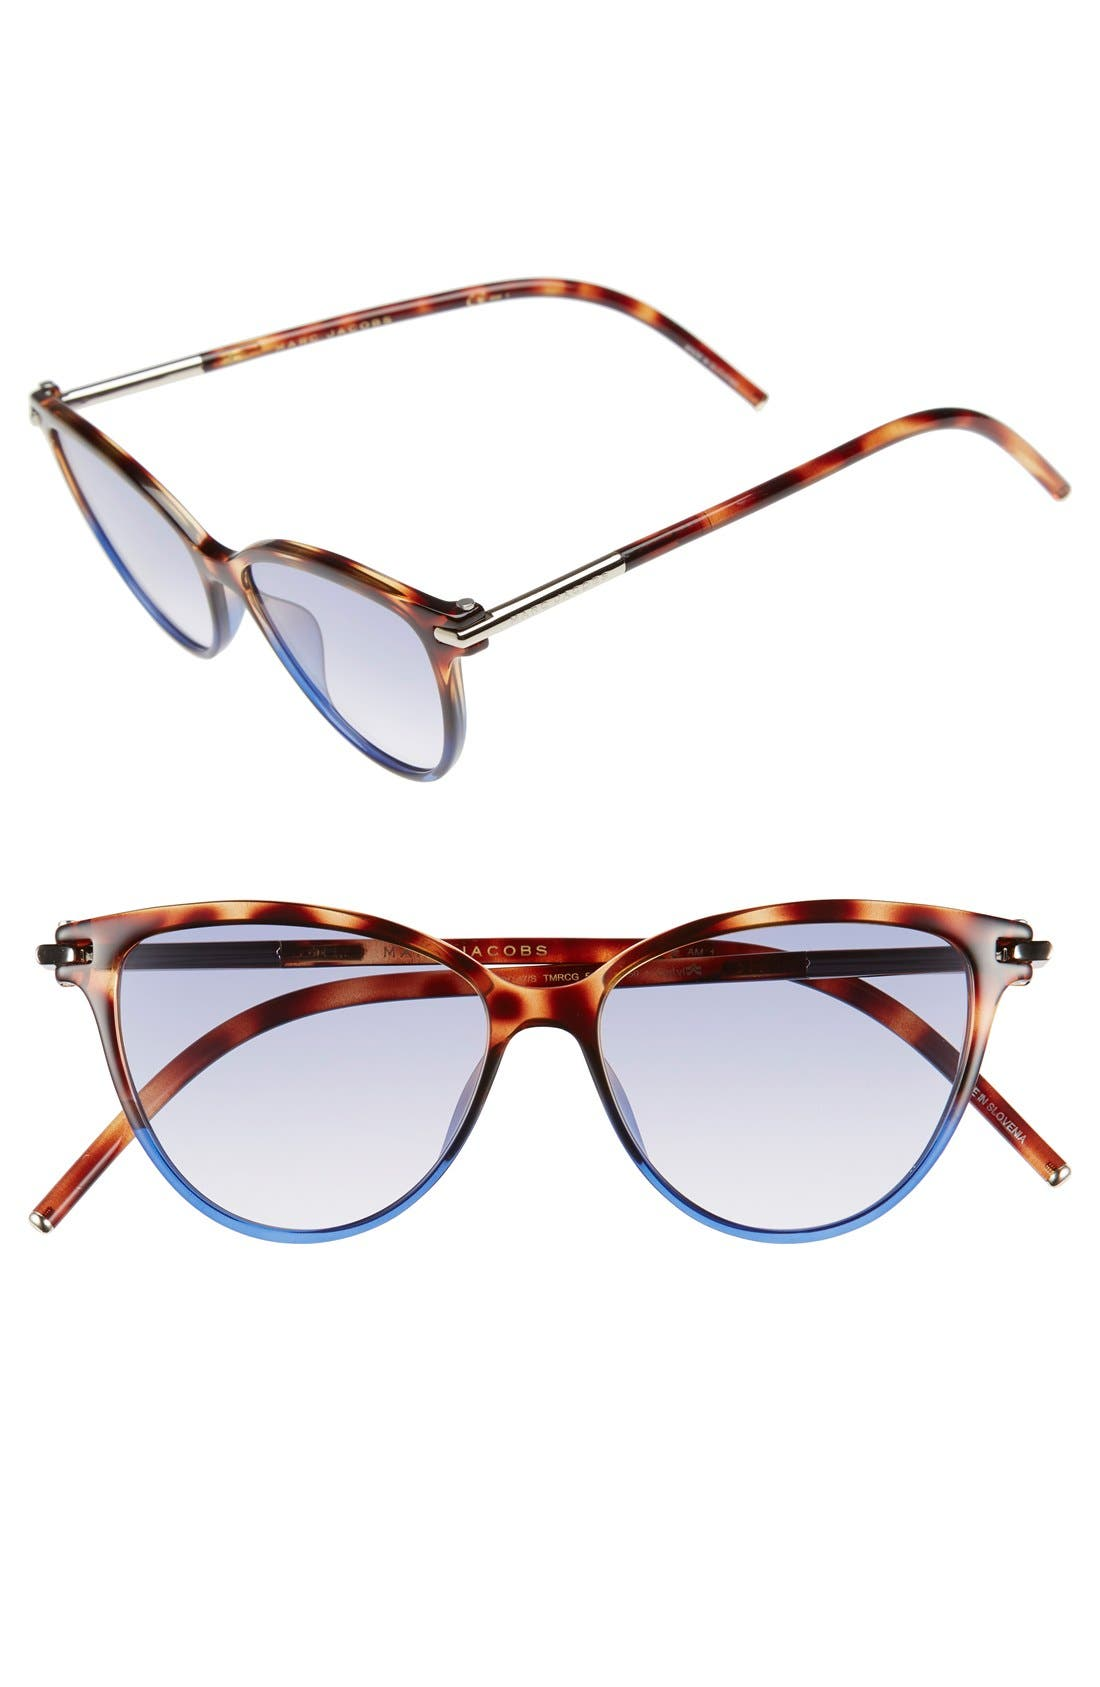 53mm Cat Eye Sunglasses,                             Main thumbnail 1, color,                             Havanabrownblue